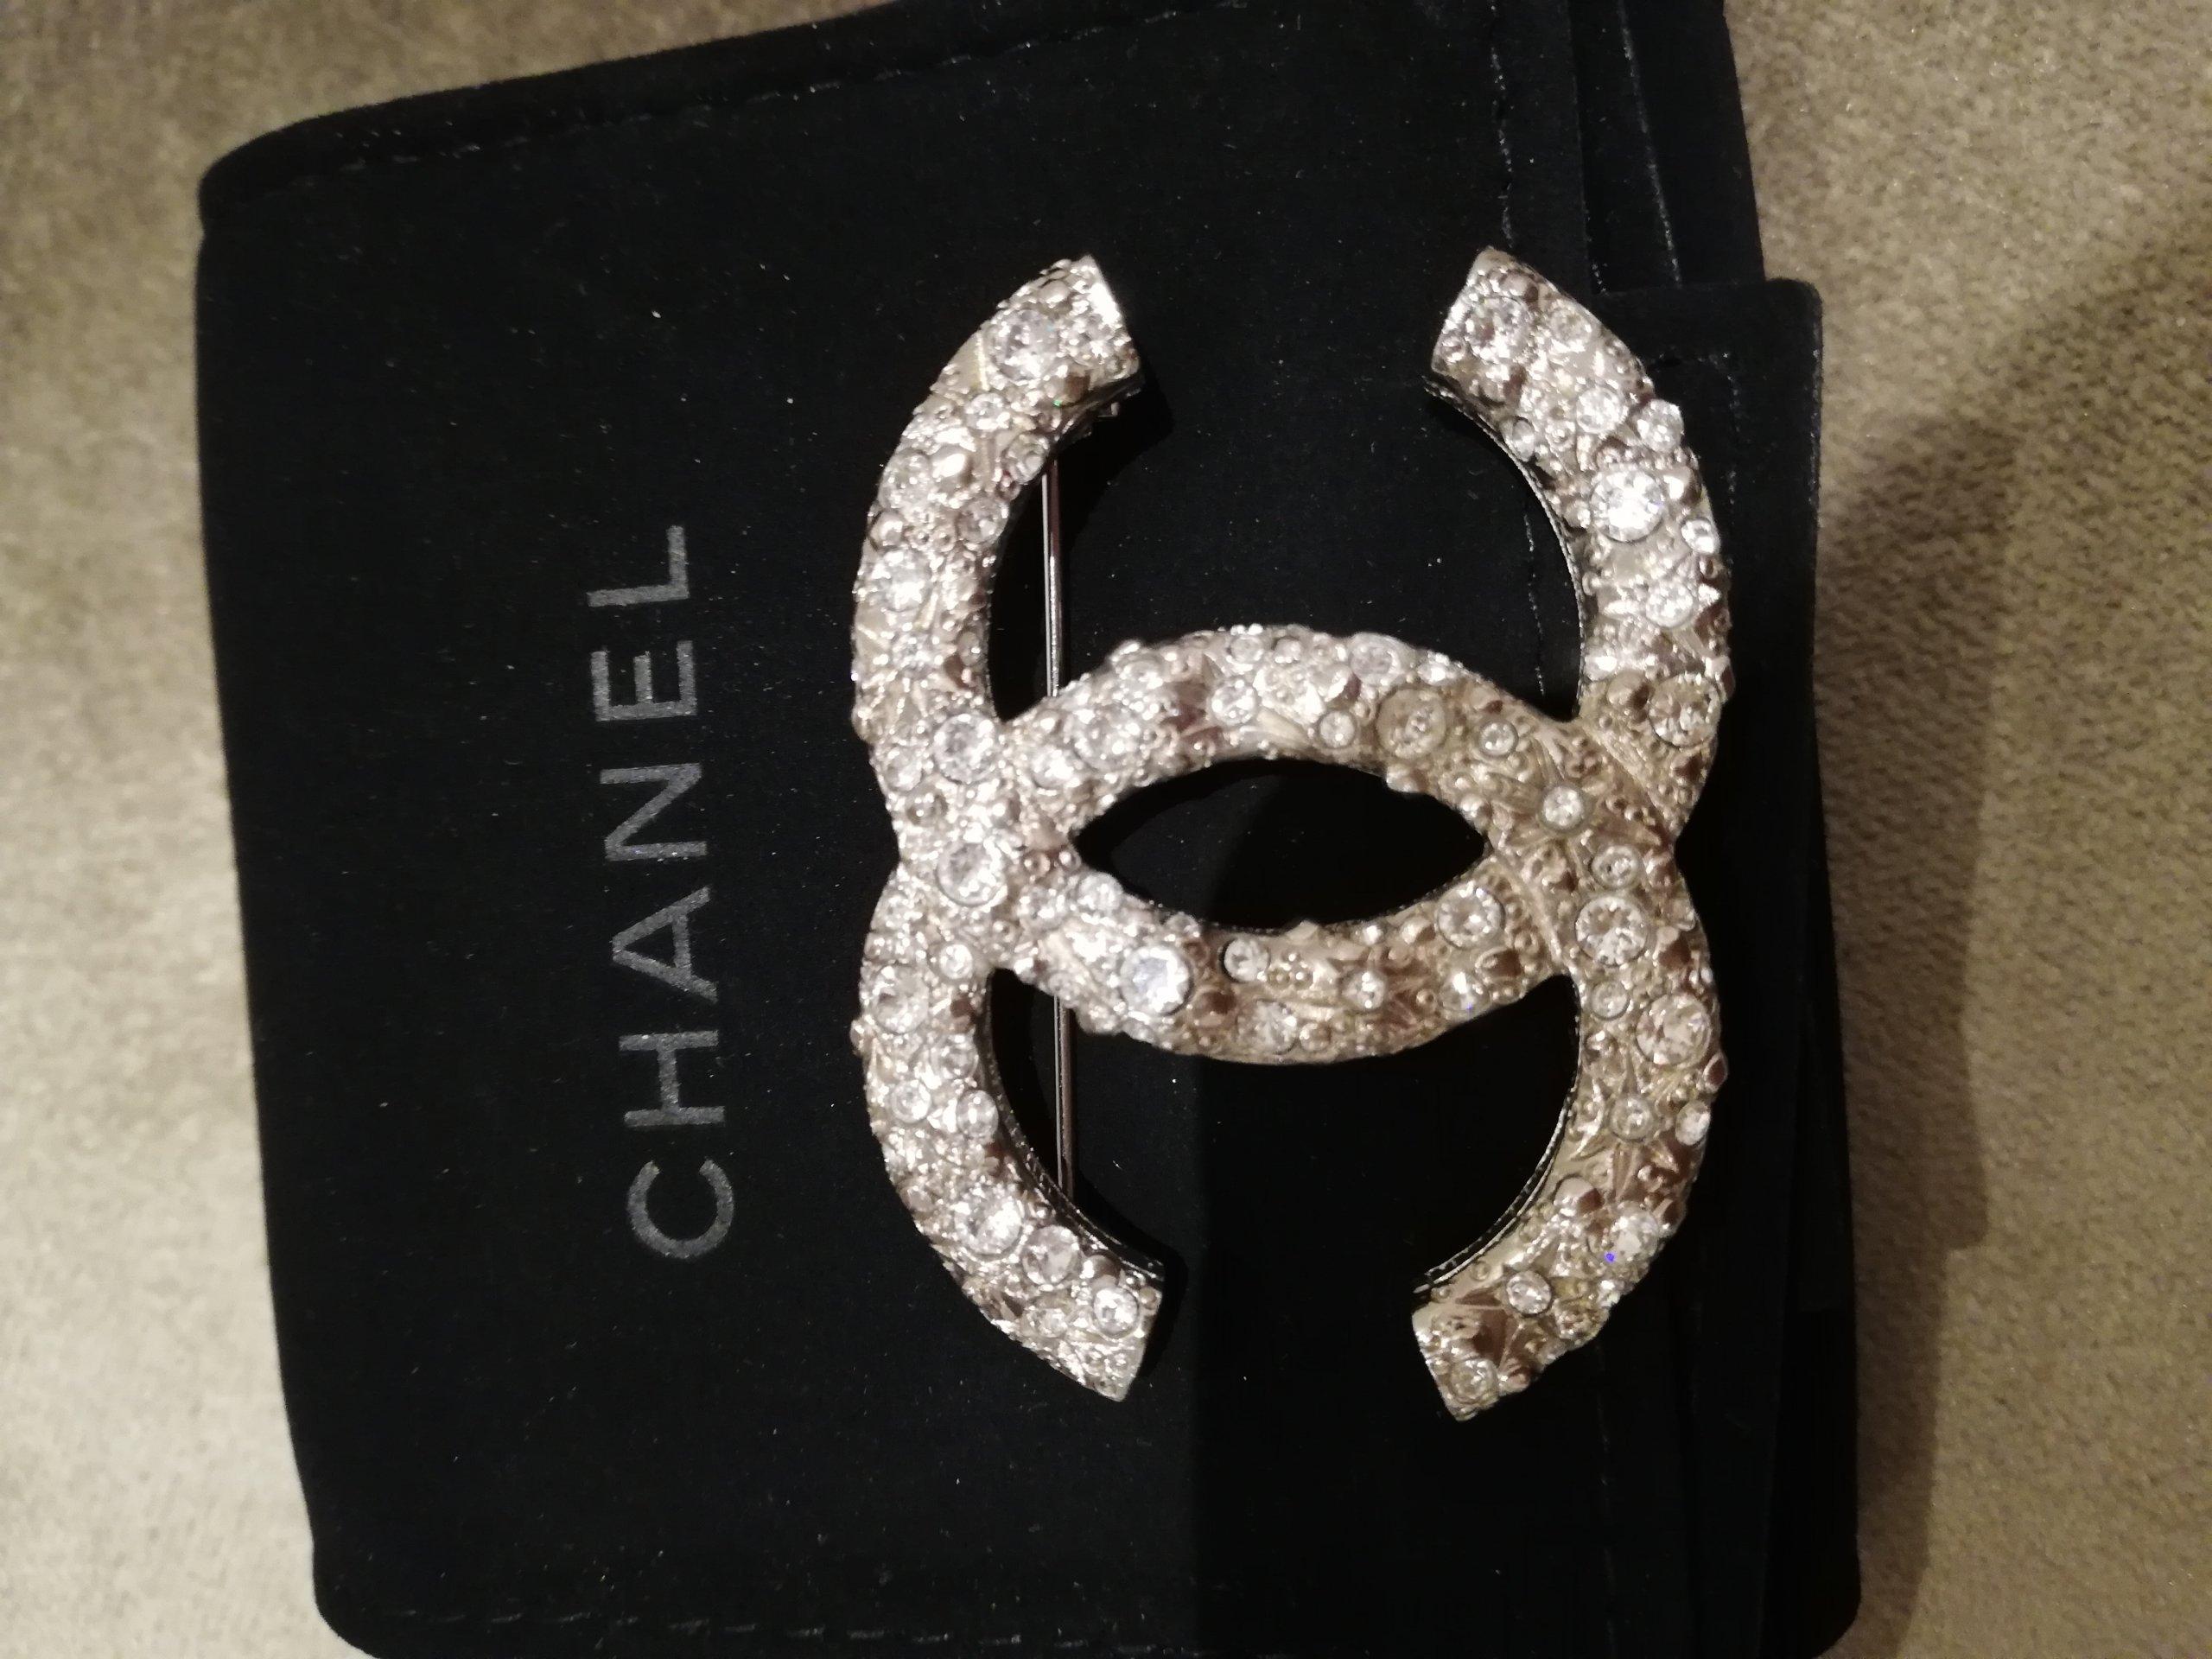 d0a3edfad9cf2 Chanel broszka - 7423601079 - oficjalne archiwum allegro